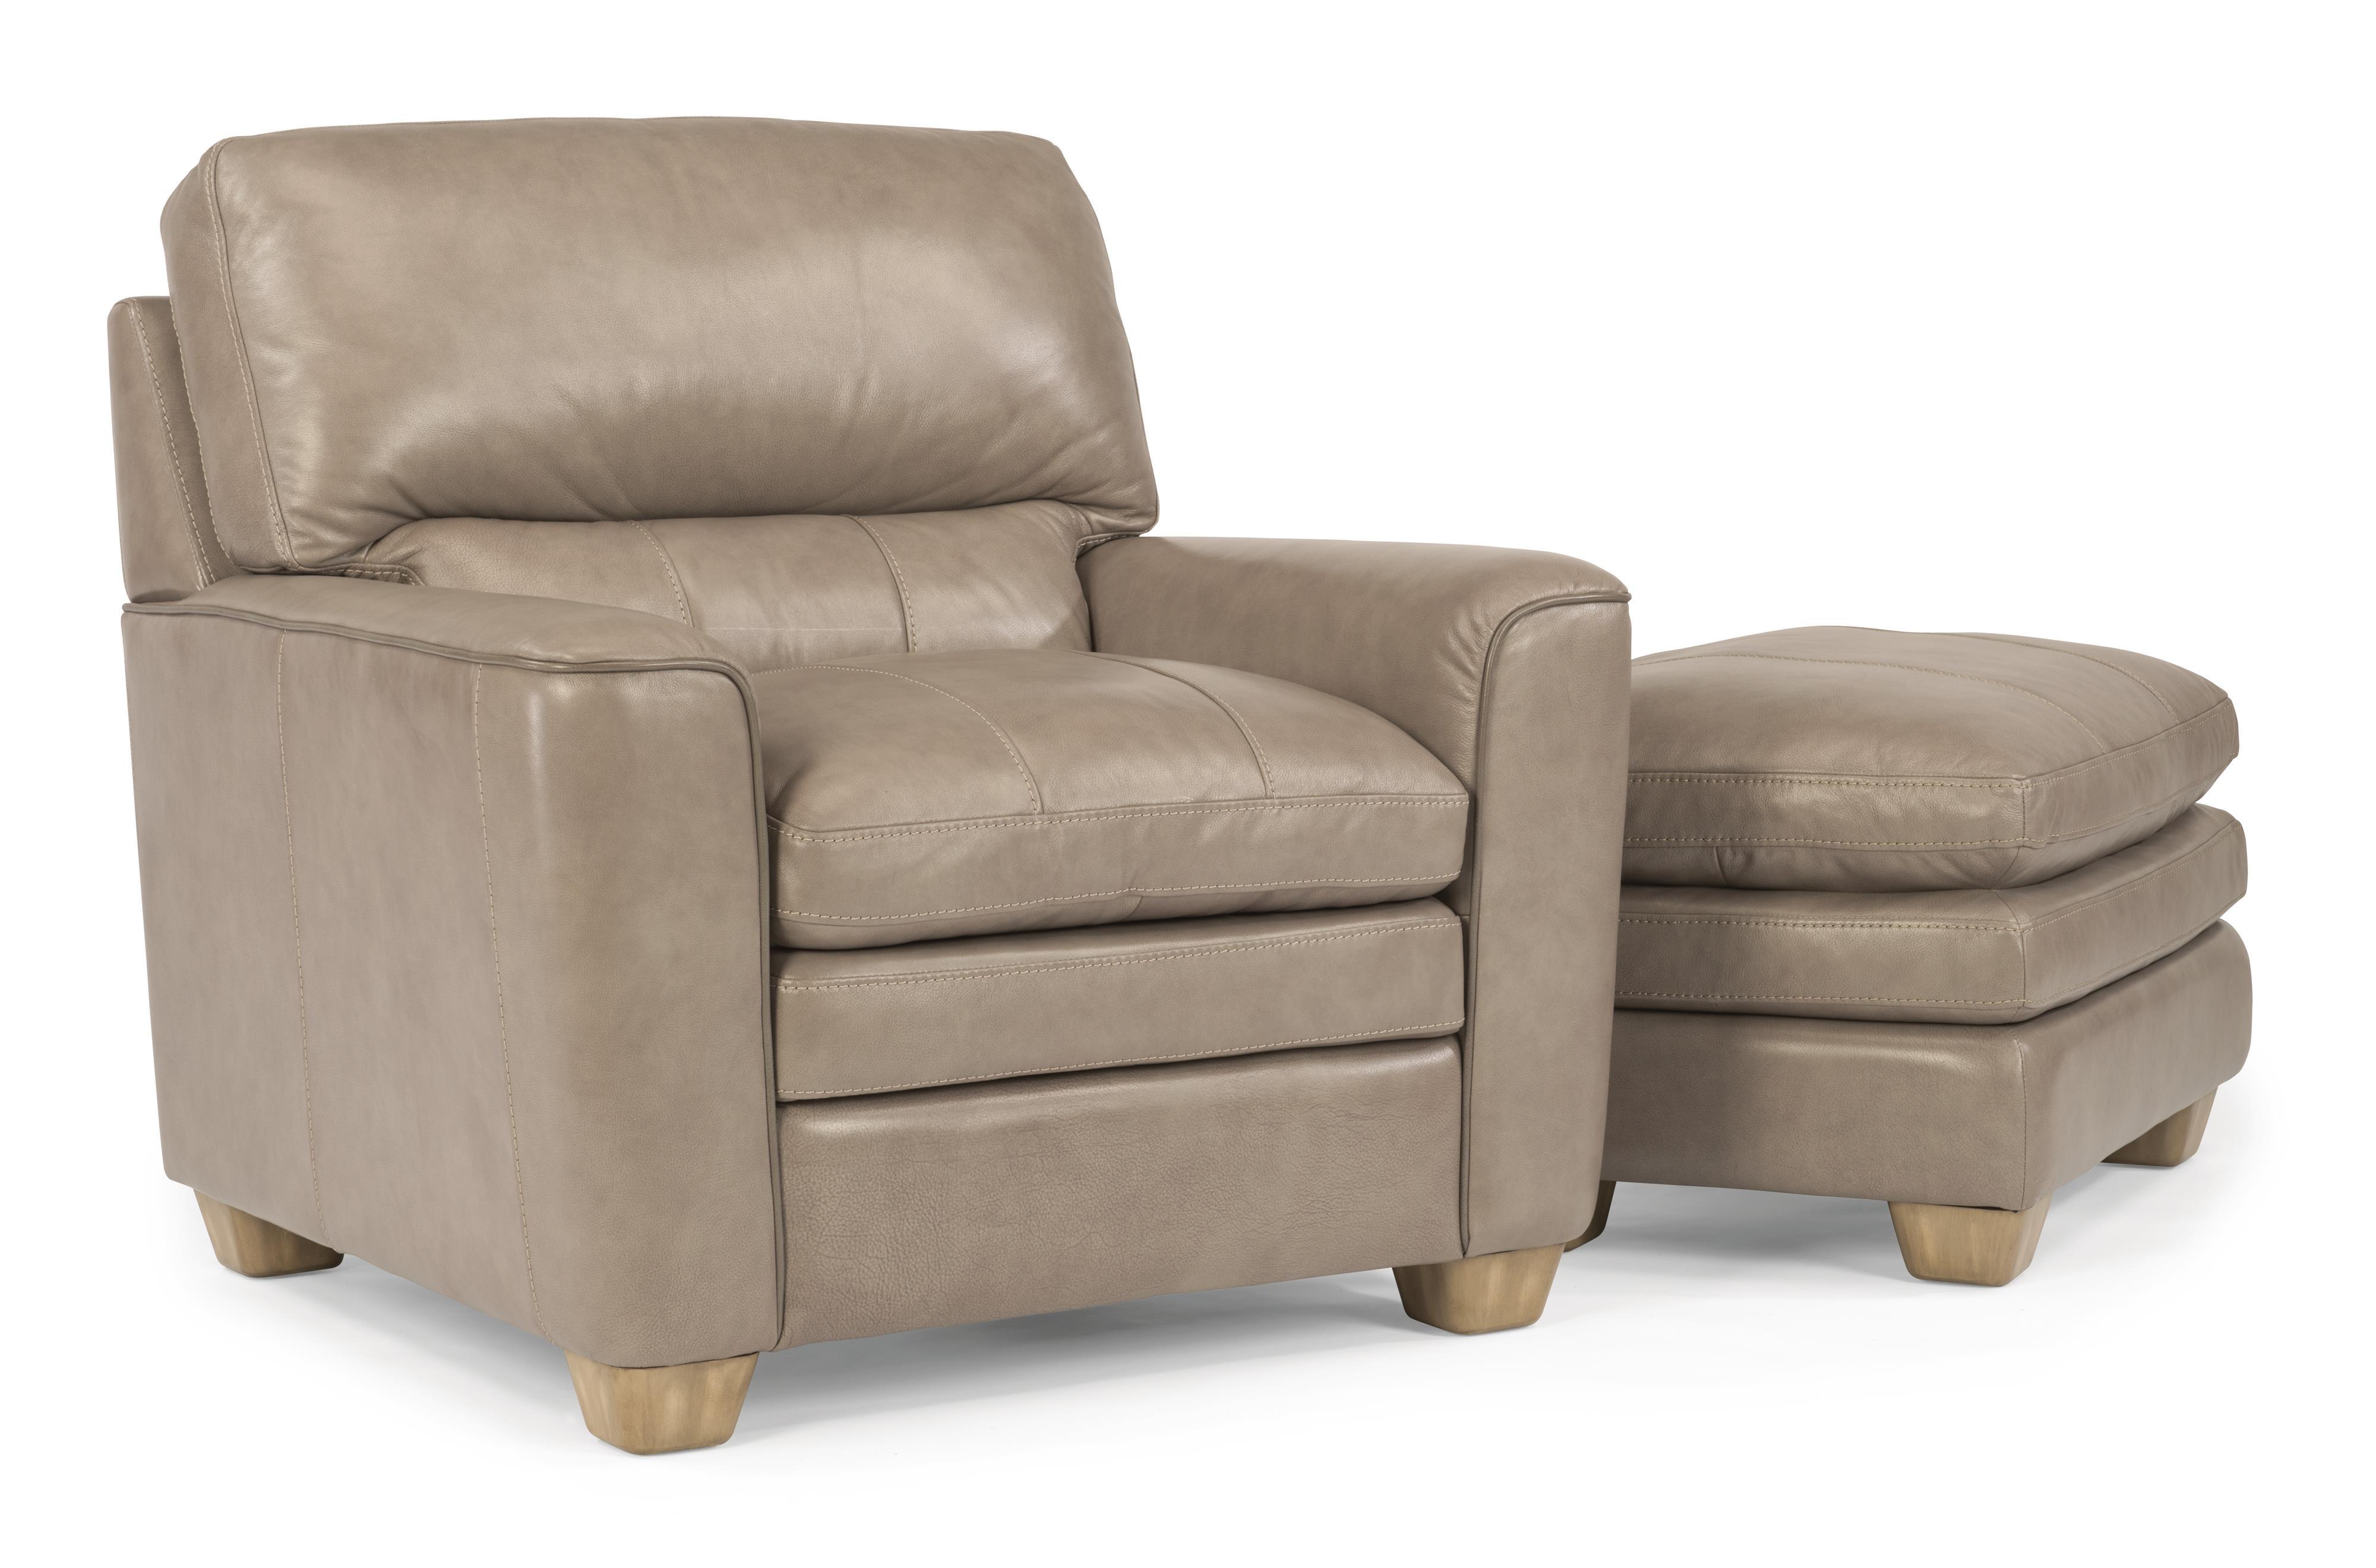 Flexsteel Latitudes-Ivy Chair & Ottoman Set - Item Number: 1304-10+1304-08-739-01